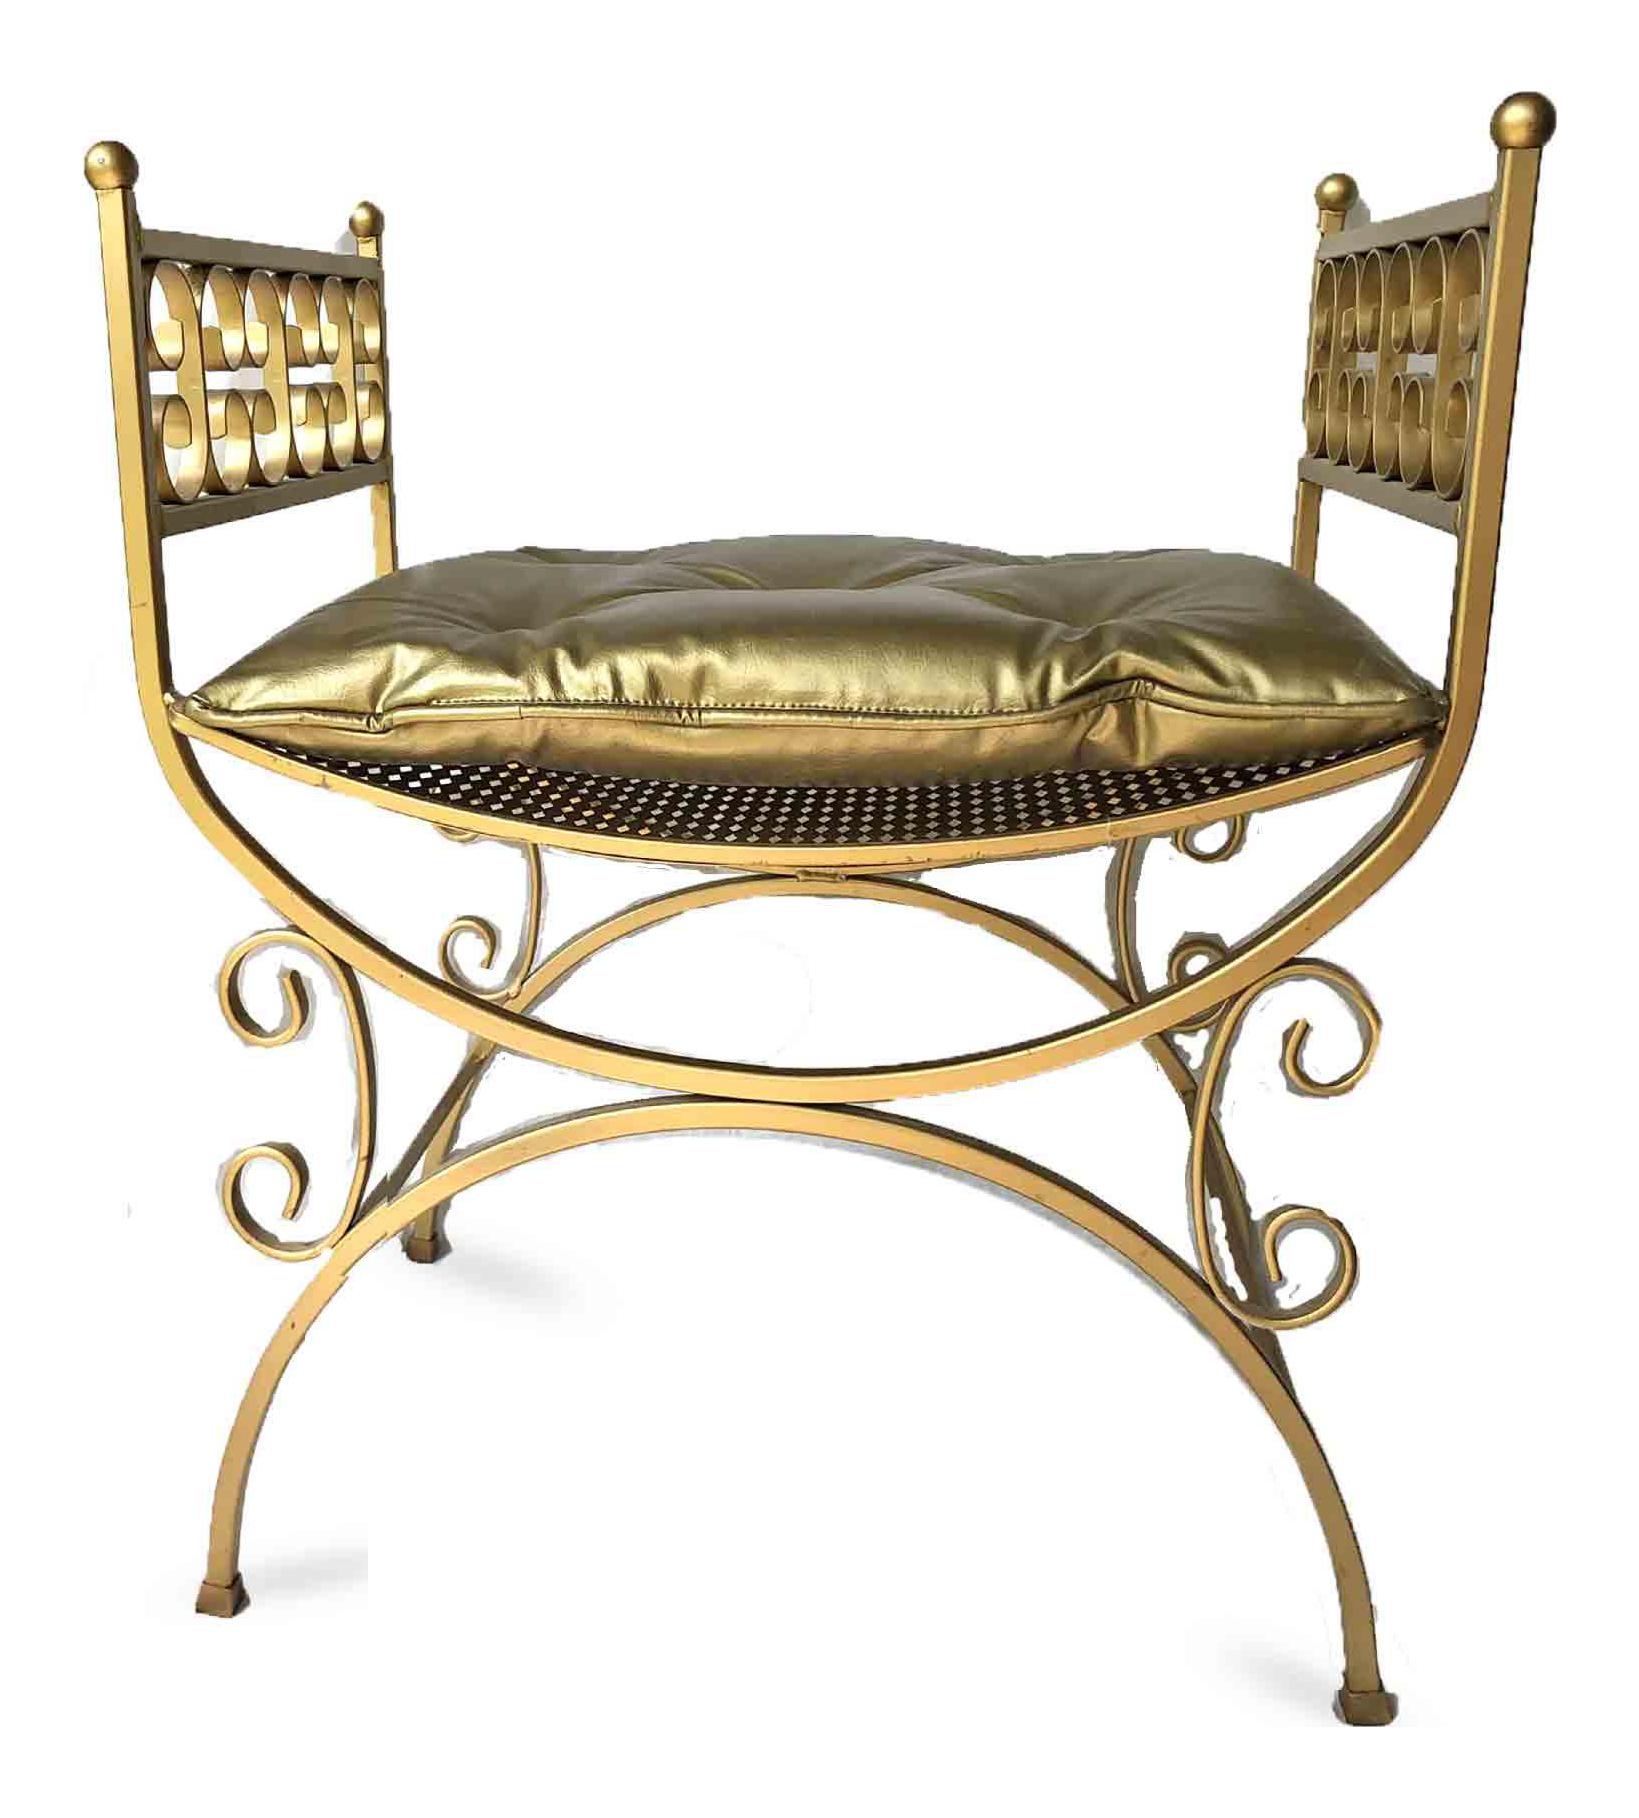 Vintage Hollywood Regency Gold Vanity Stool Chairish